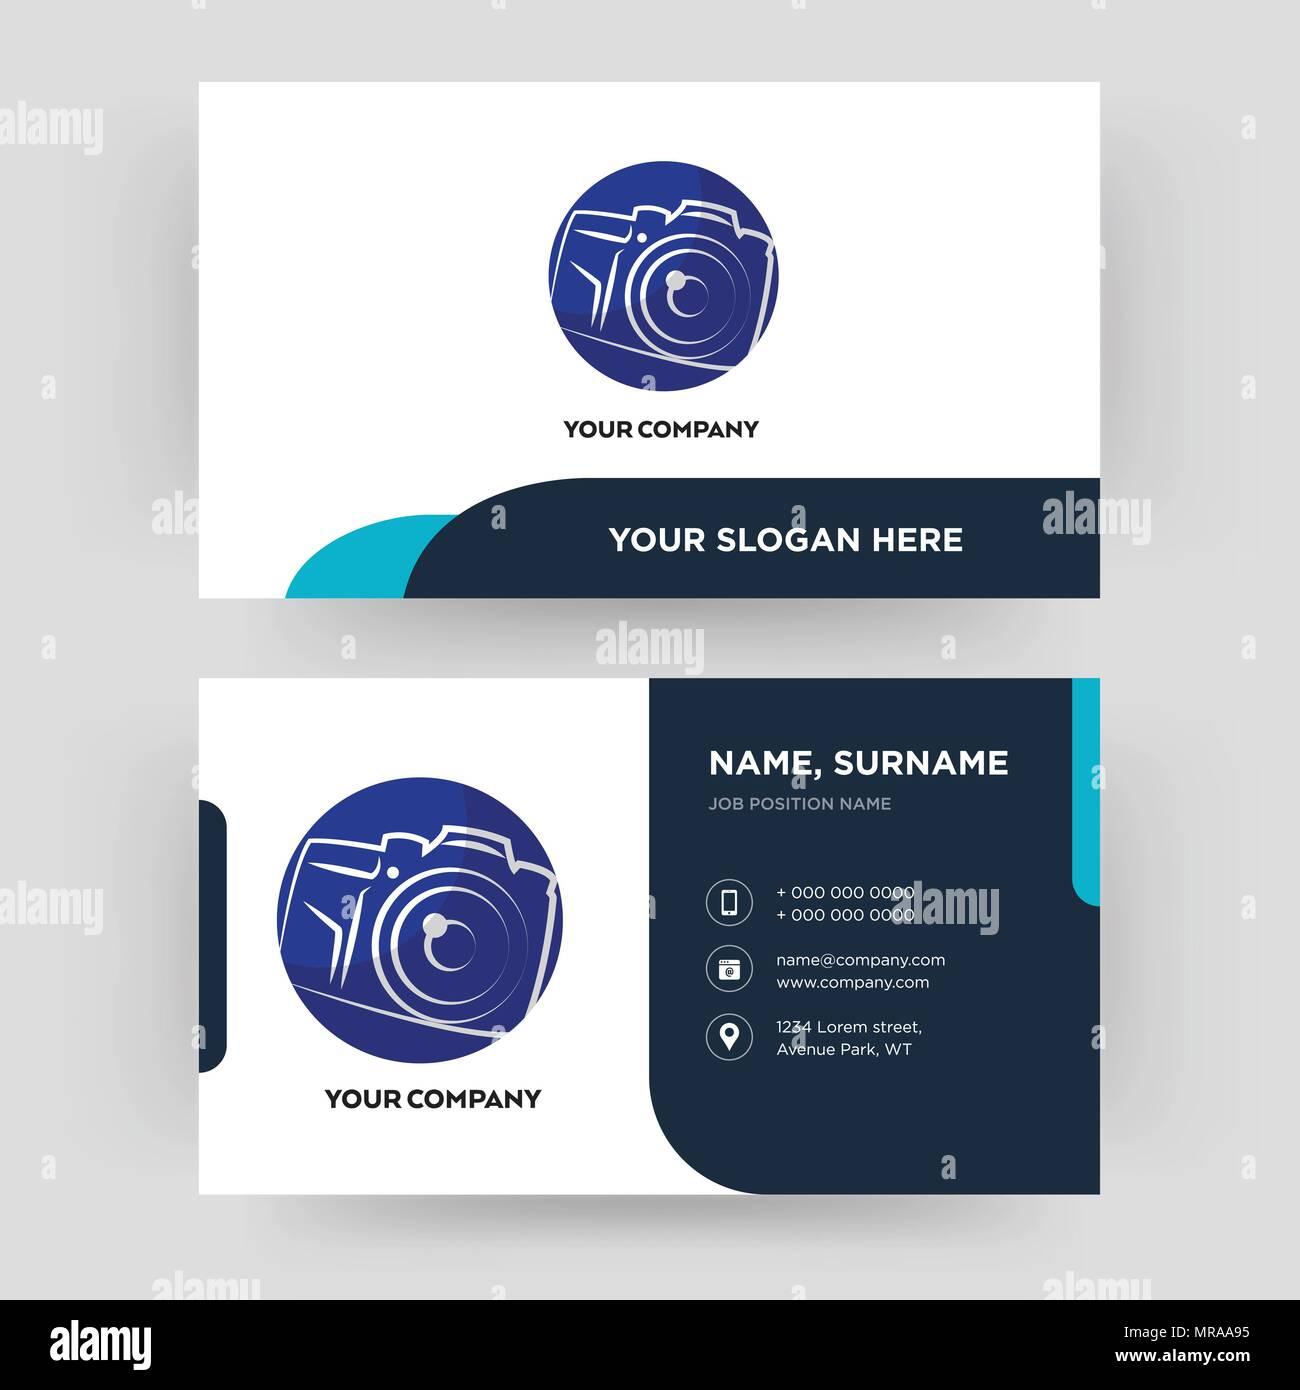 Photography camera business card design template visiting for your photography camera business card design template visiting for your company modern creative and clean identity card vector colourmoves